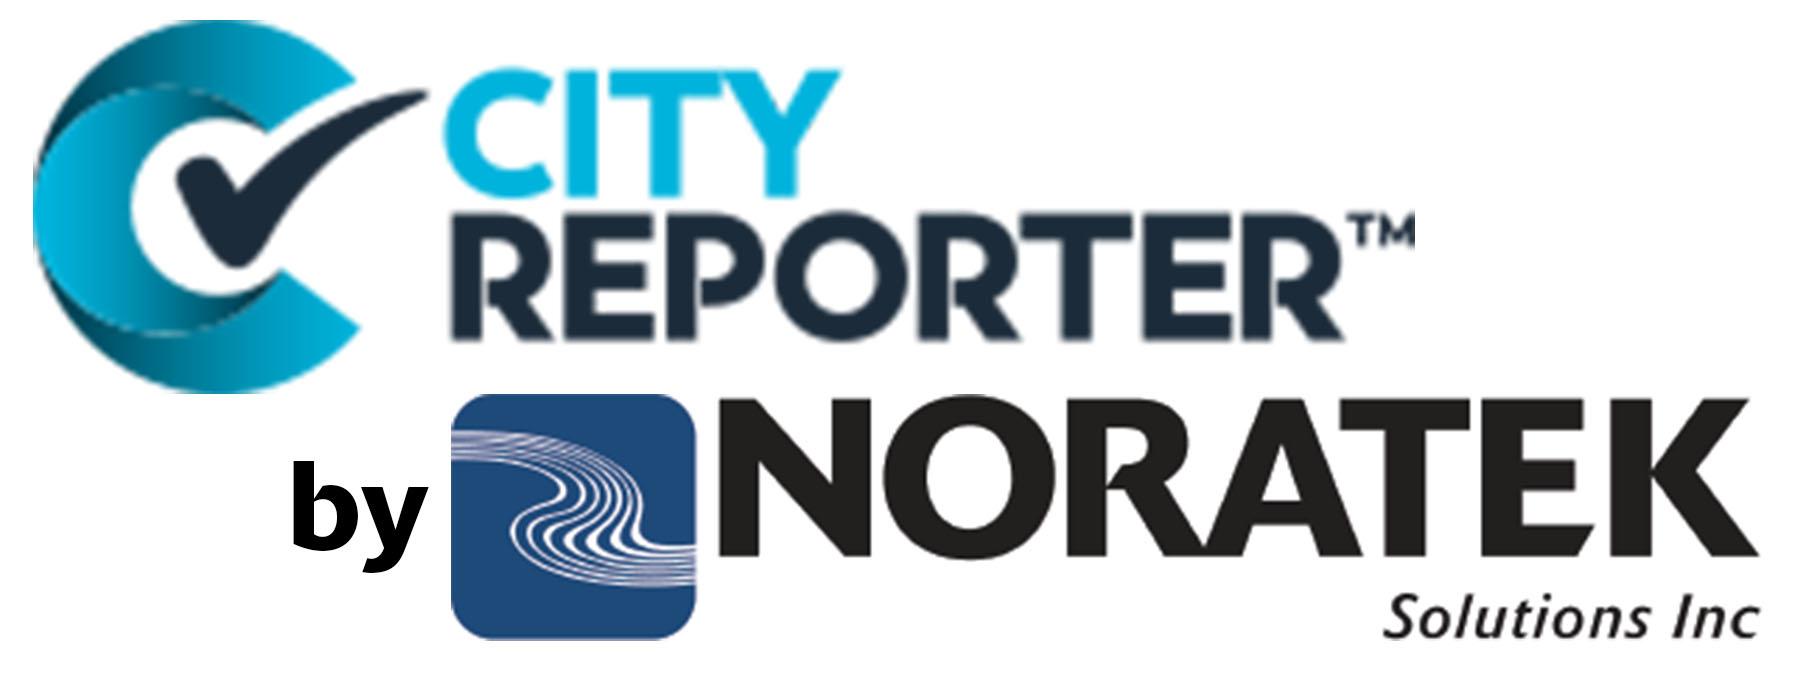 CityReporter-by-Noratek-Logo